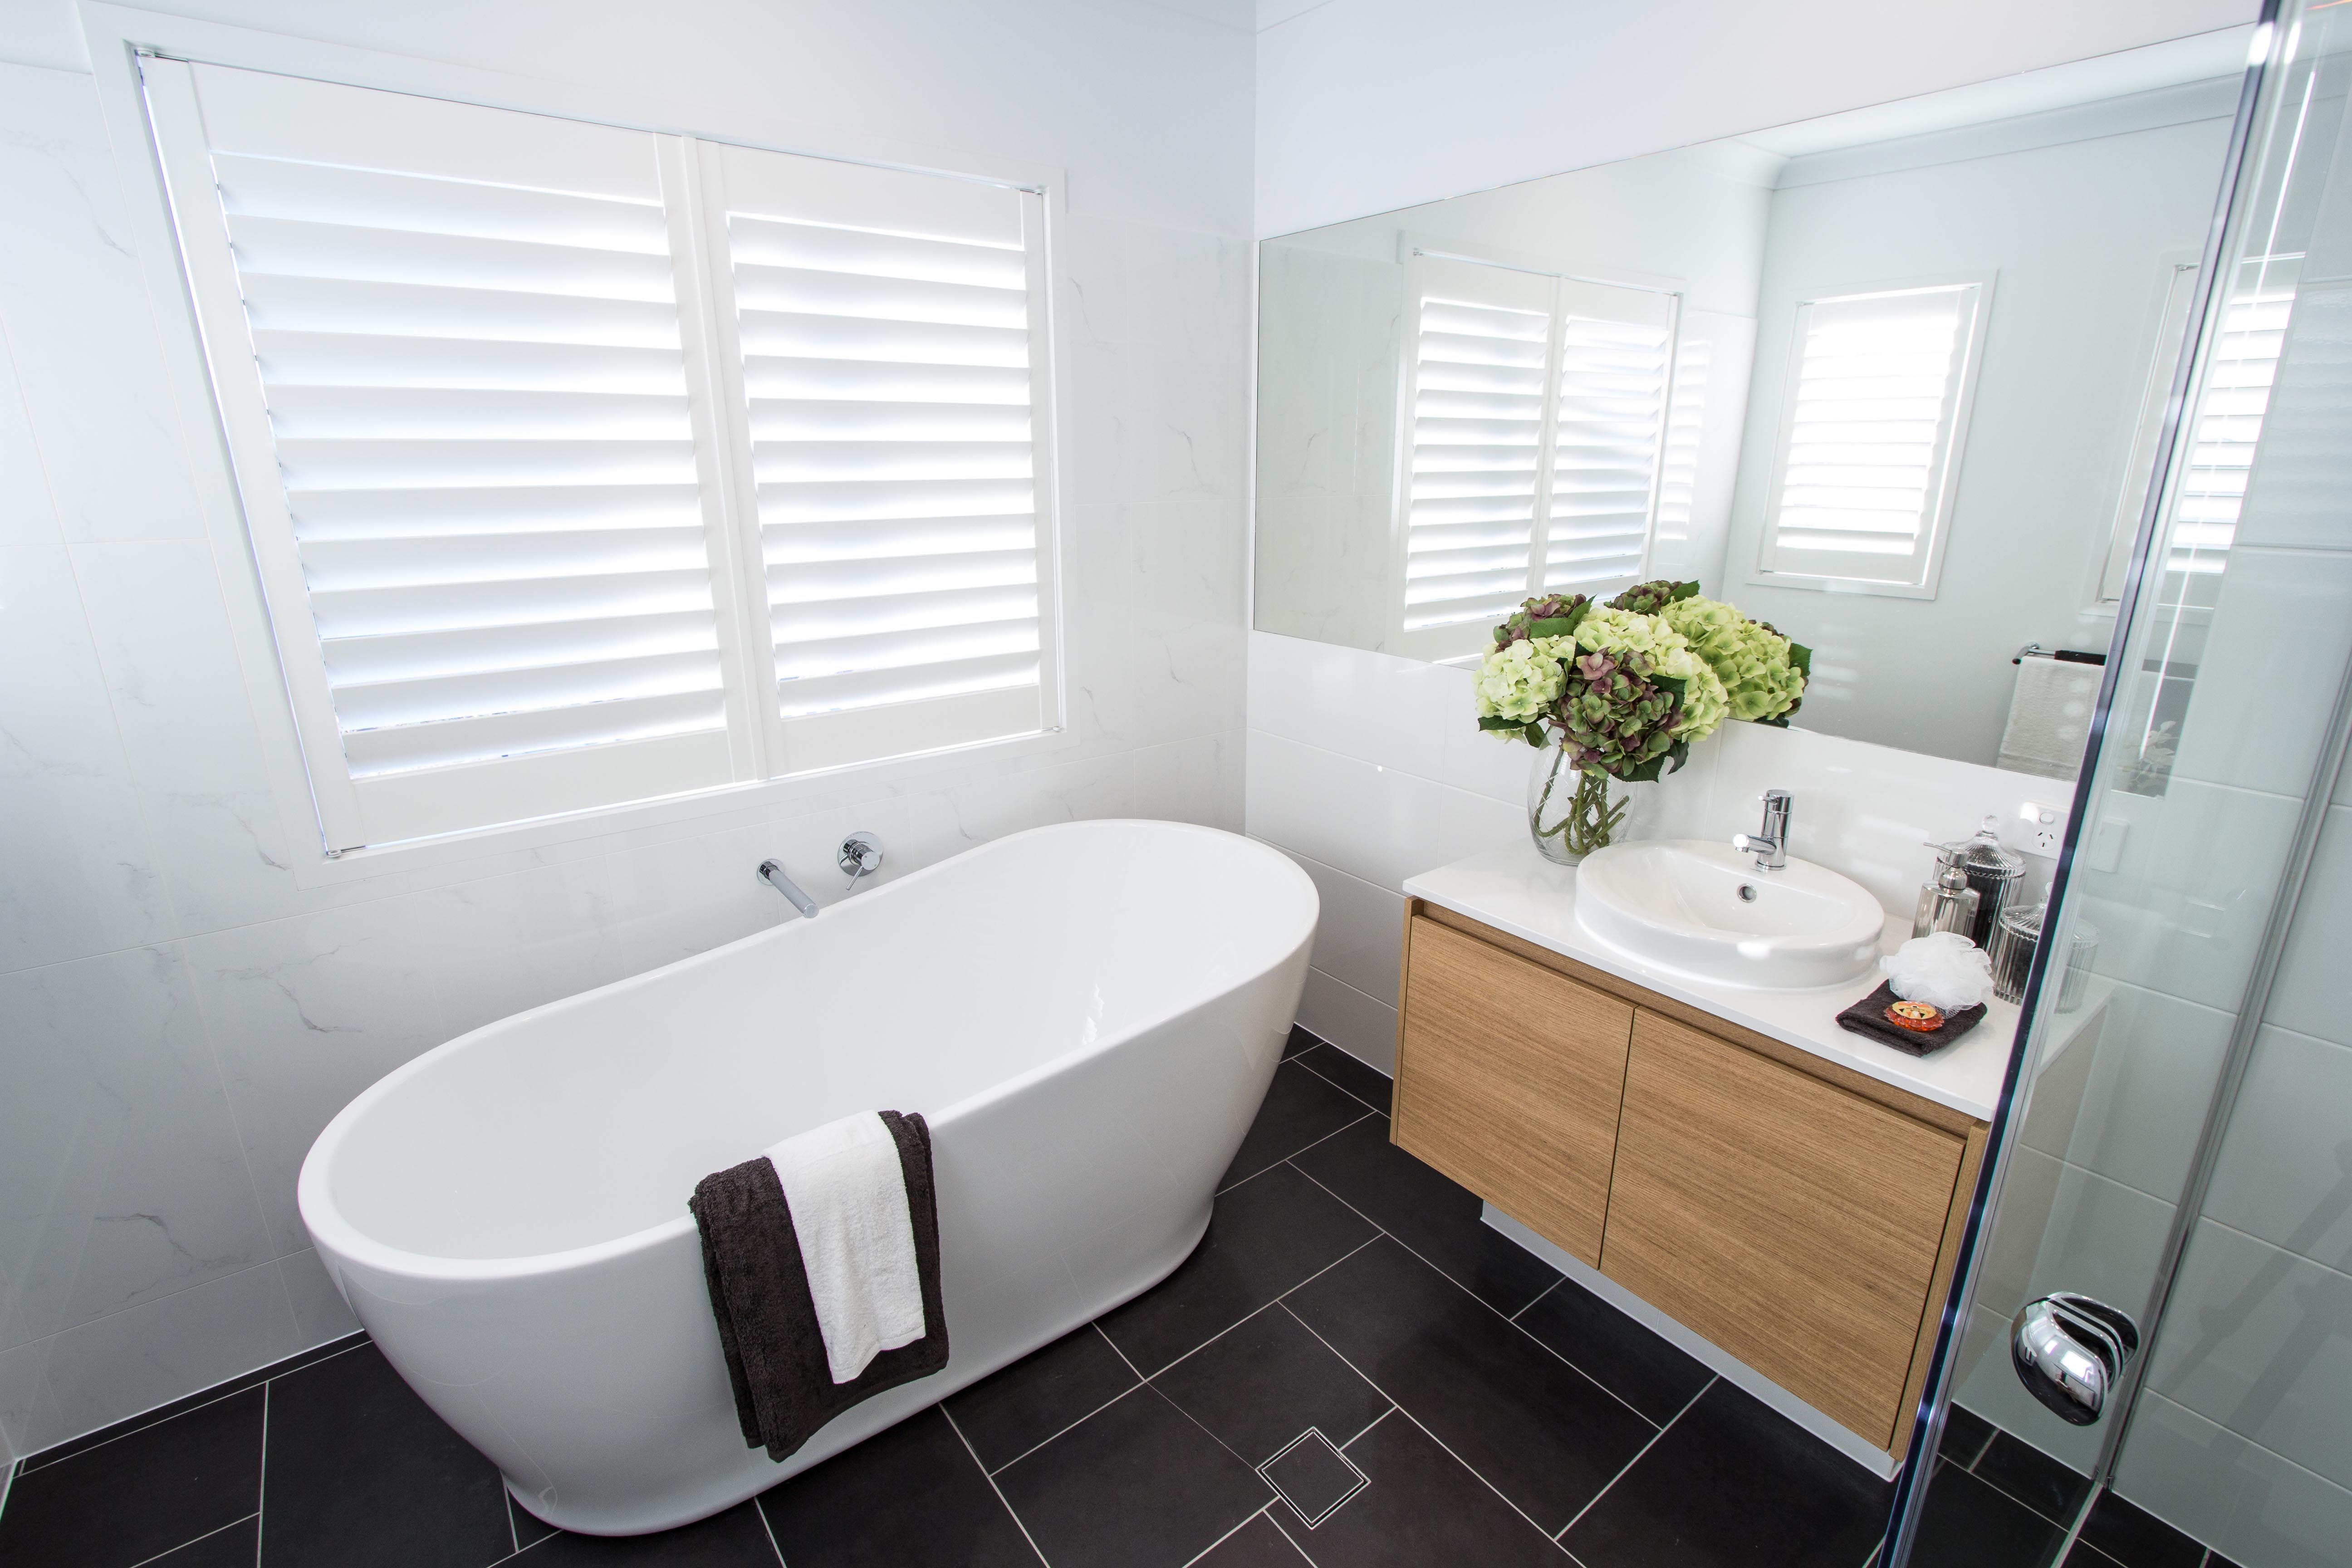 Bathroom. Freestanding bath. Charcoal tiles. Timber vanity. | The ...